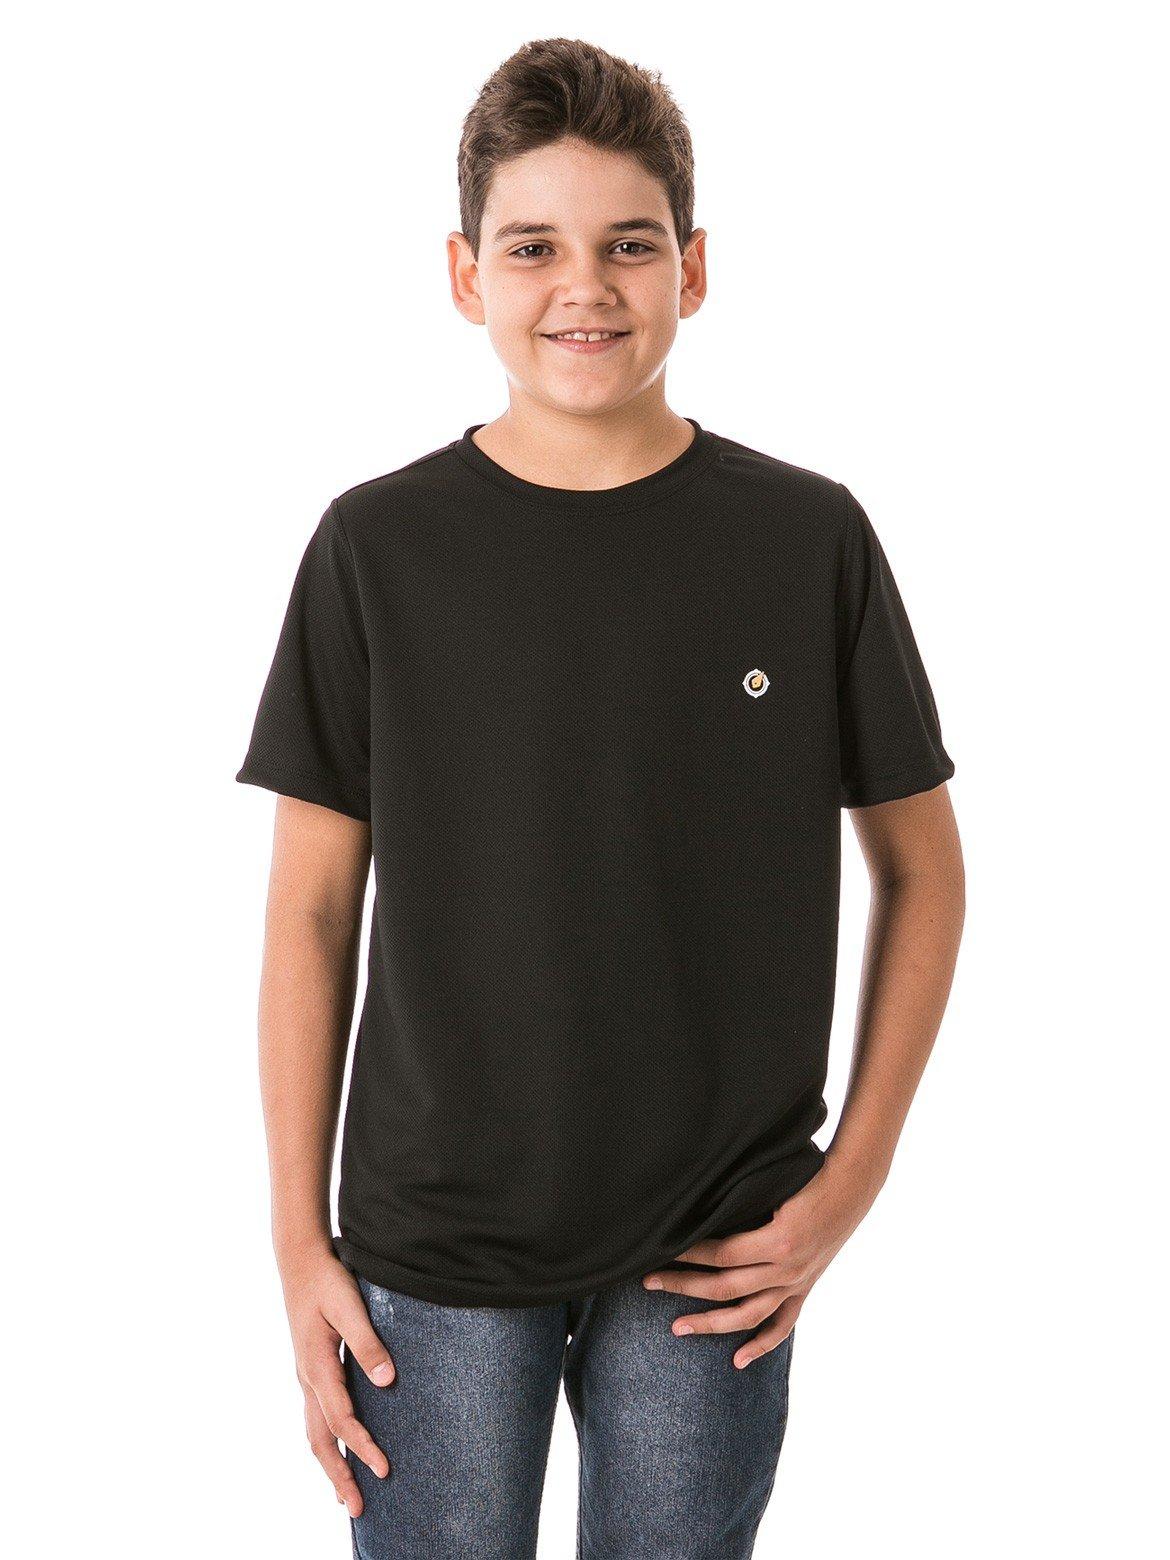 infantil masculinas t shirt curta dry preta frente b